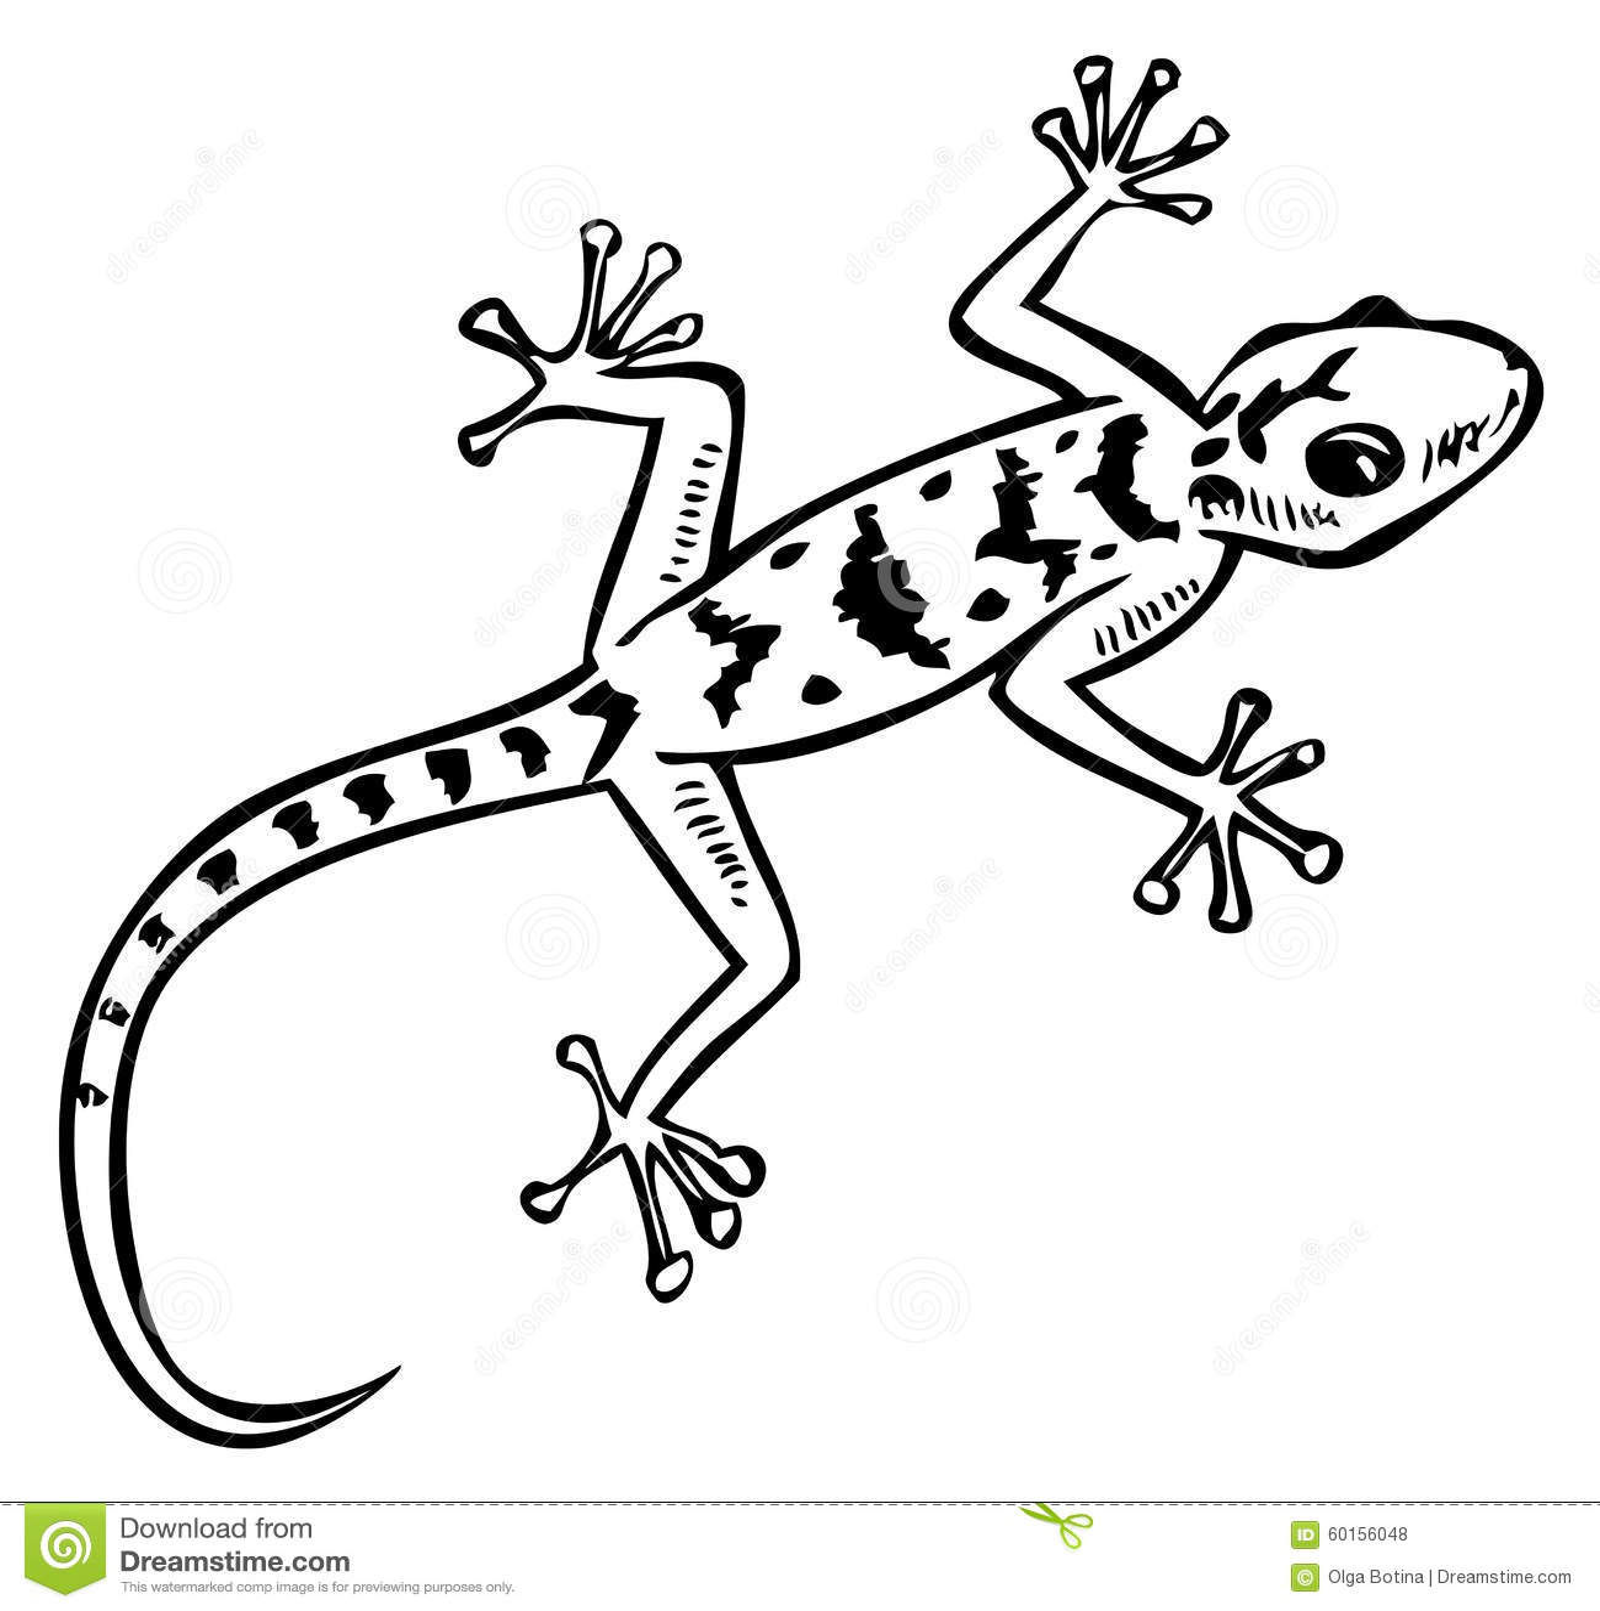 Gecko Lizard Stock Illustrations – 2,387 Gecko Lizard Stock ... for Lizard Clipart Black And White  53kxo